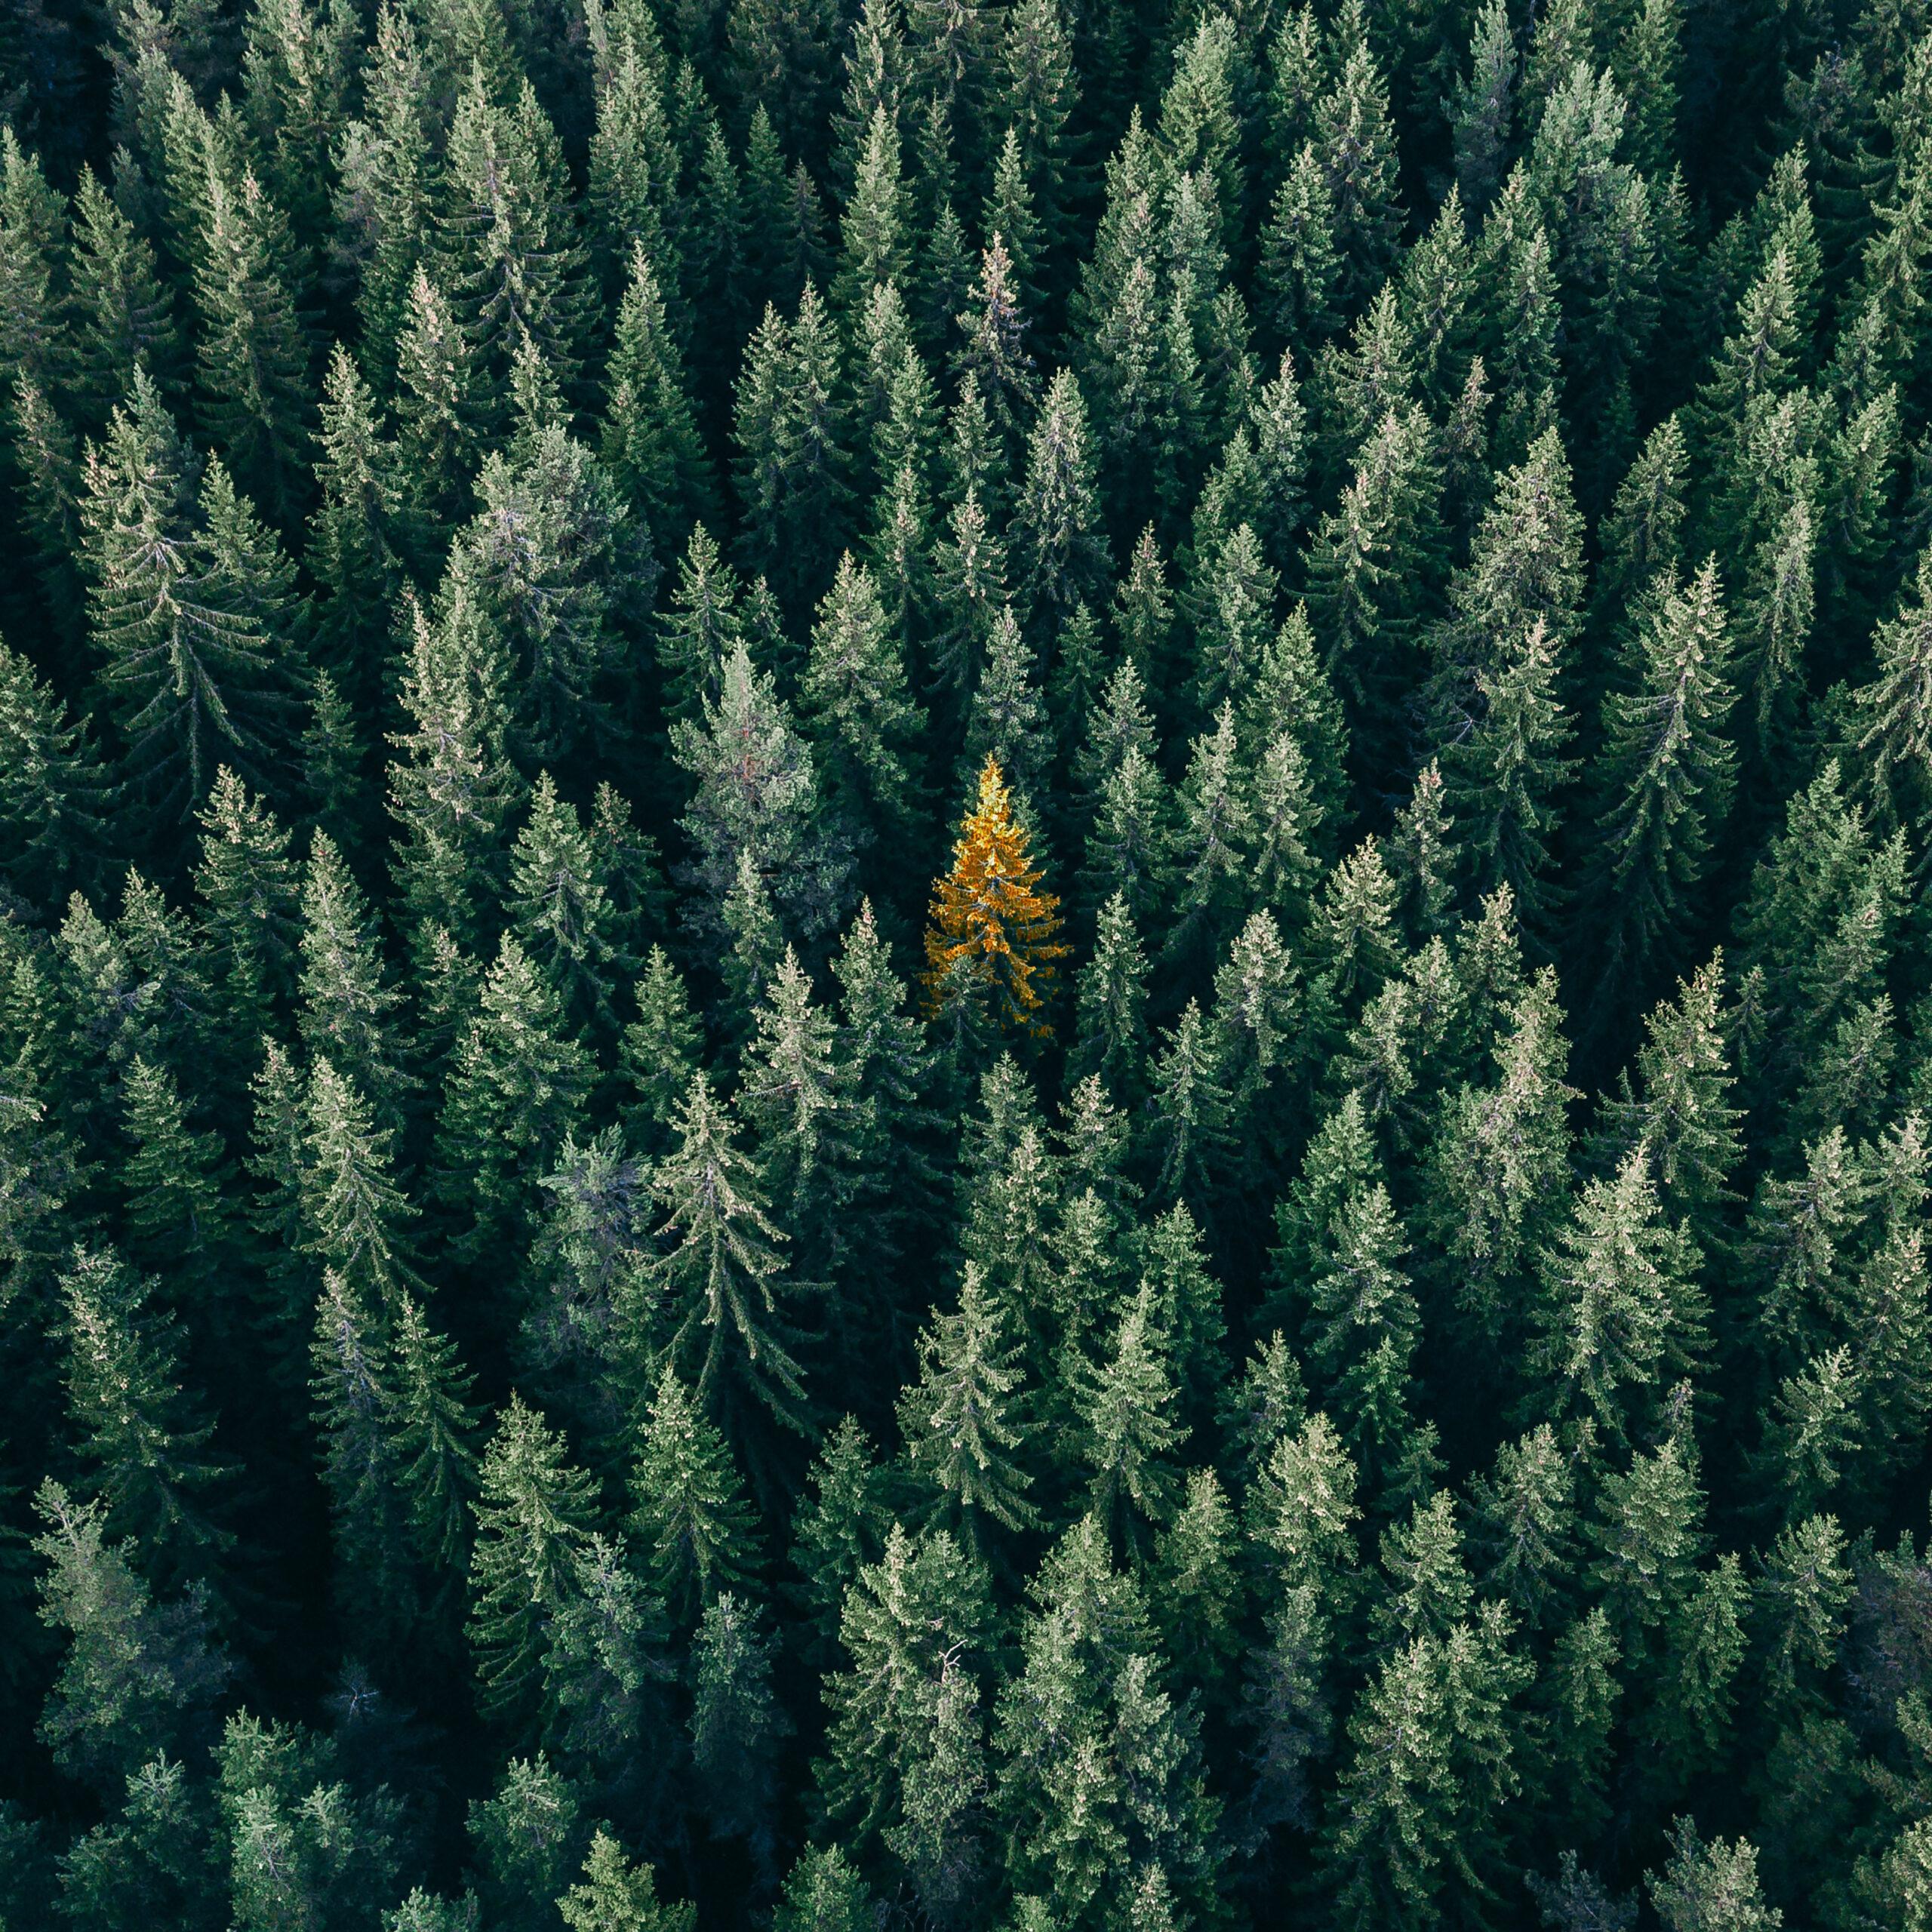 tree_Q